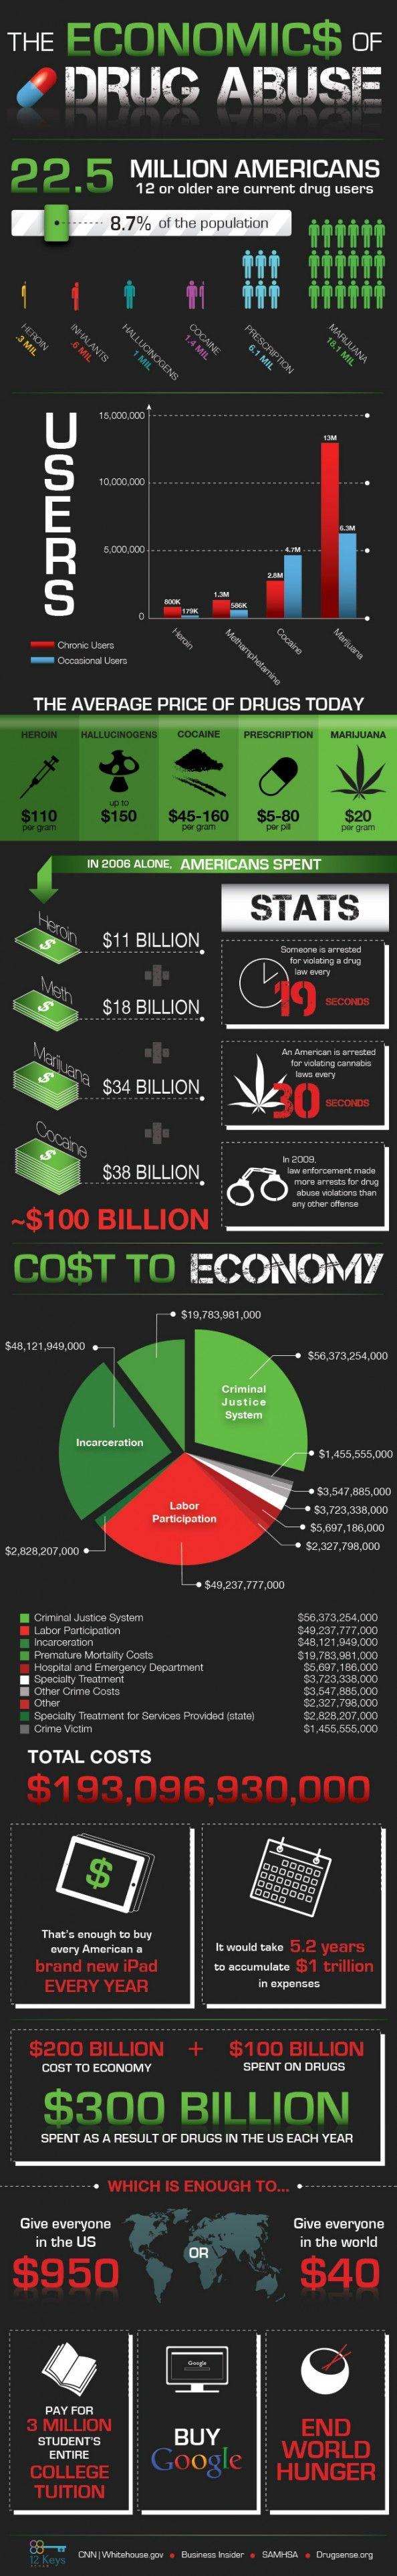 The Economics of Drug Abuse Infographic